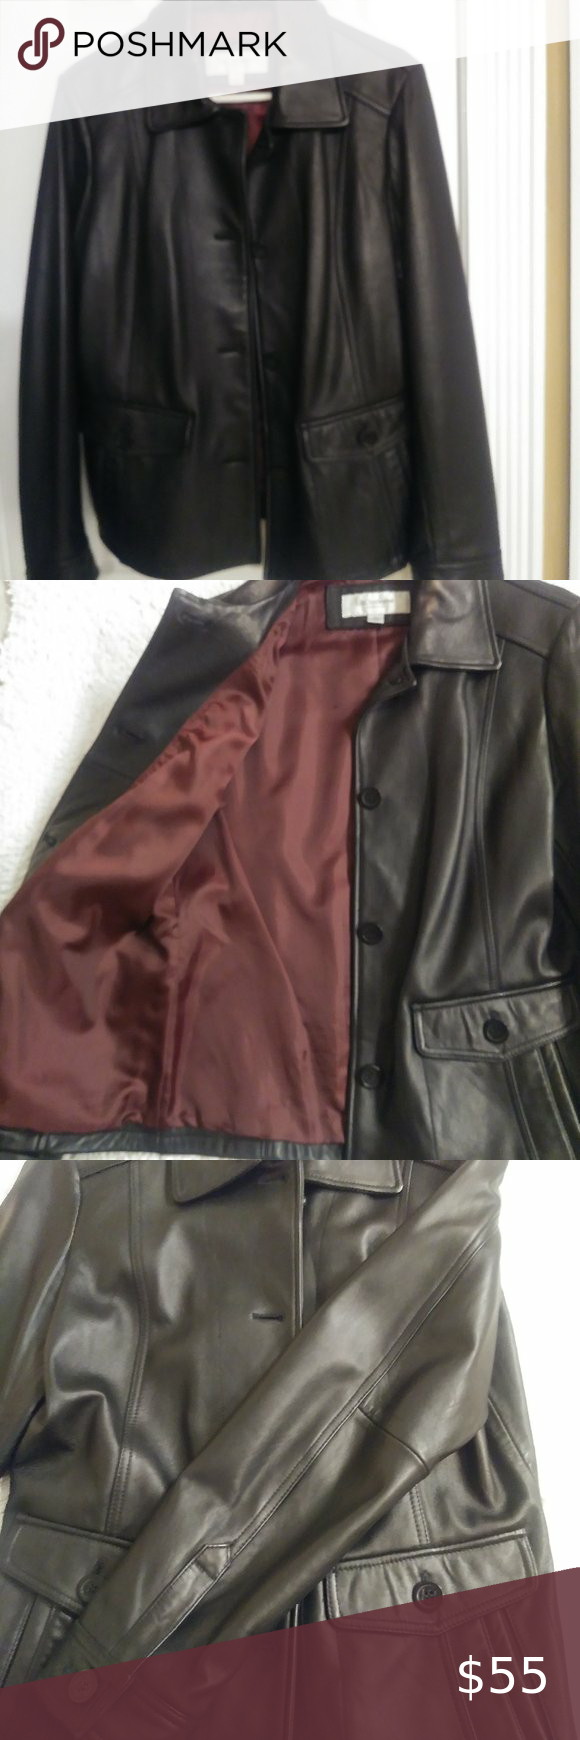 Liz Claiborne Black Genuine Leather Jacket Leather Jacket Genuine Leather Jackets Jackets